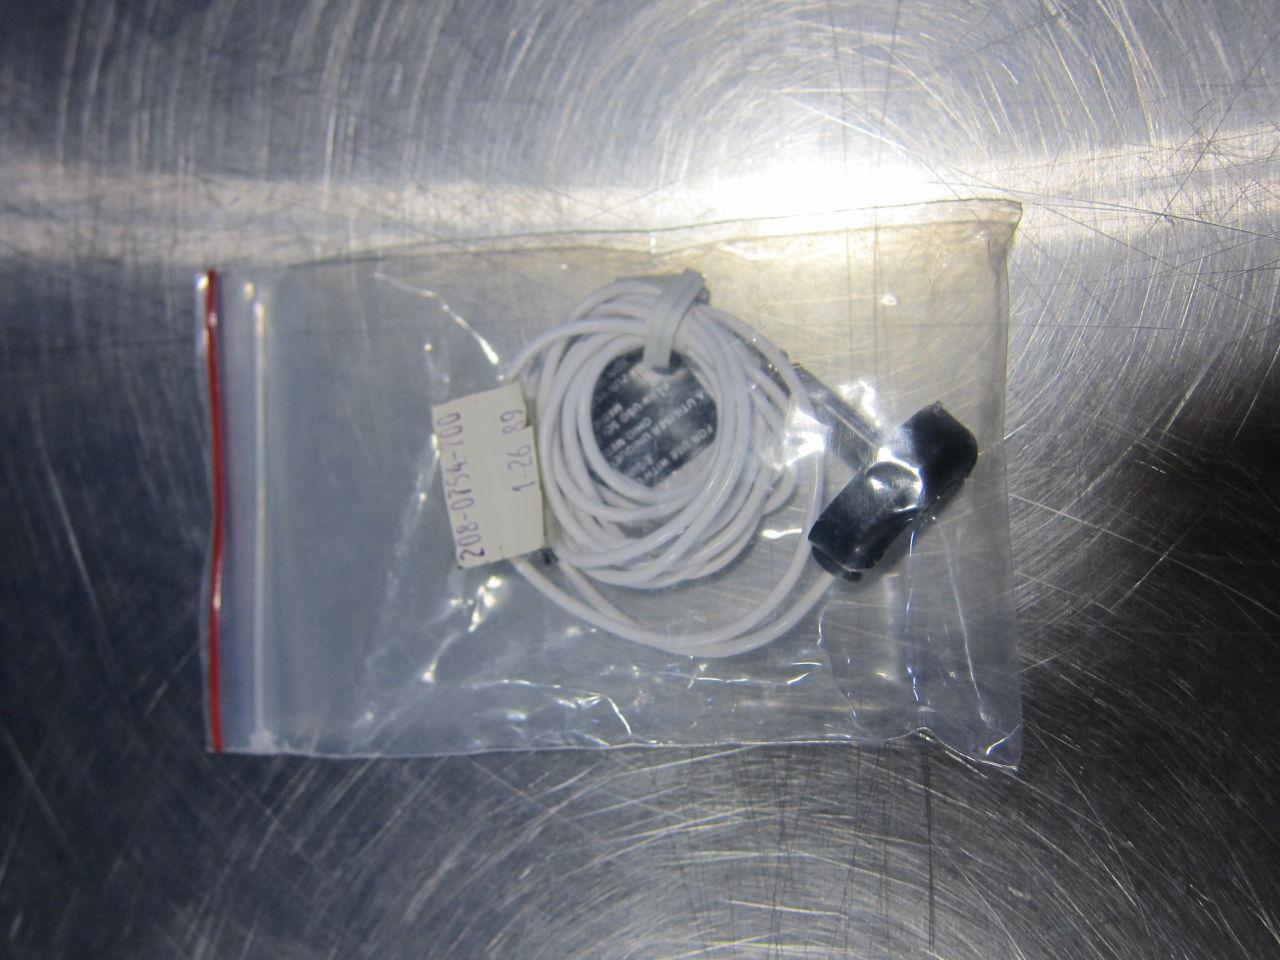 OHIO MEDICAL LA001 Thermistor Probe